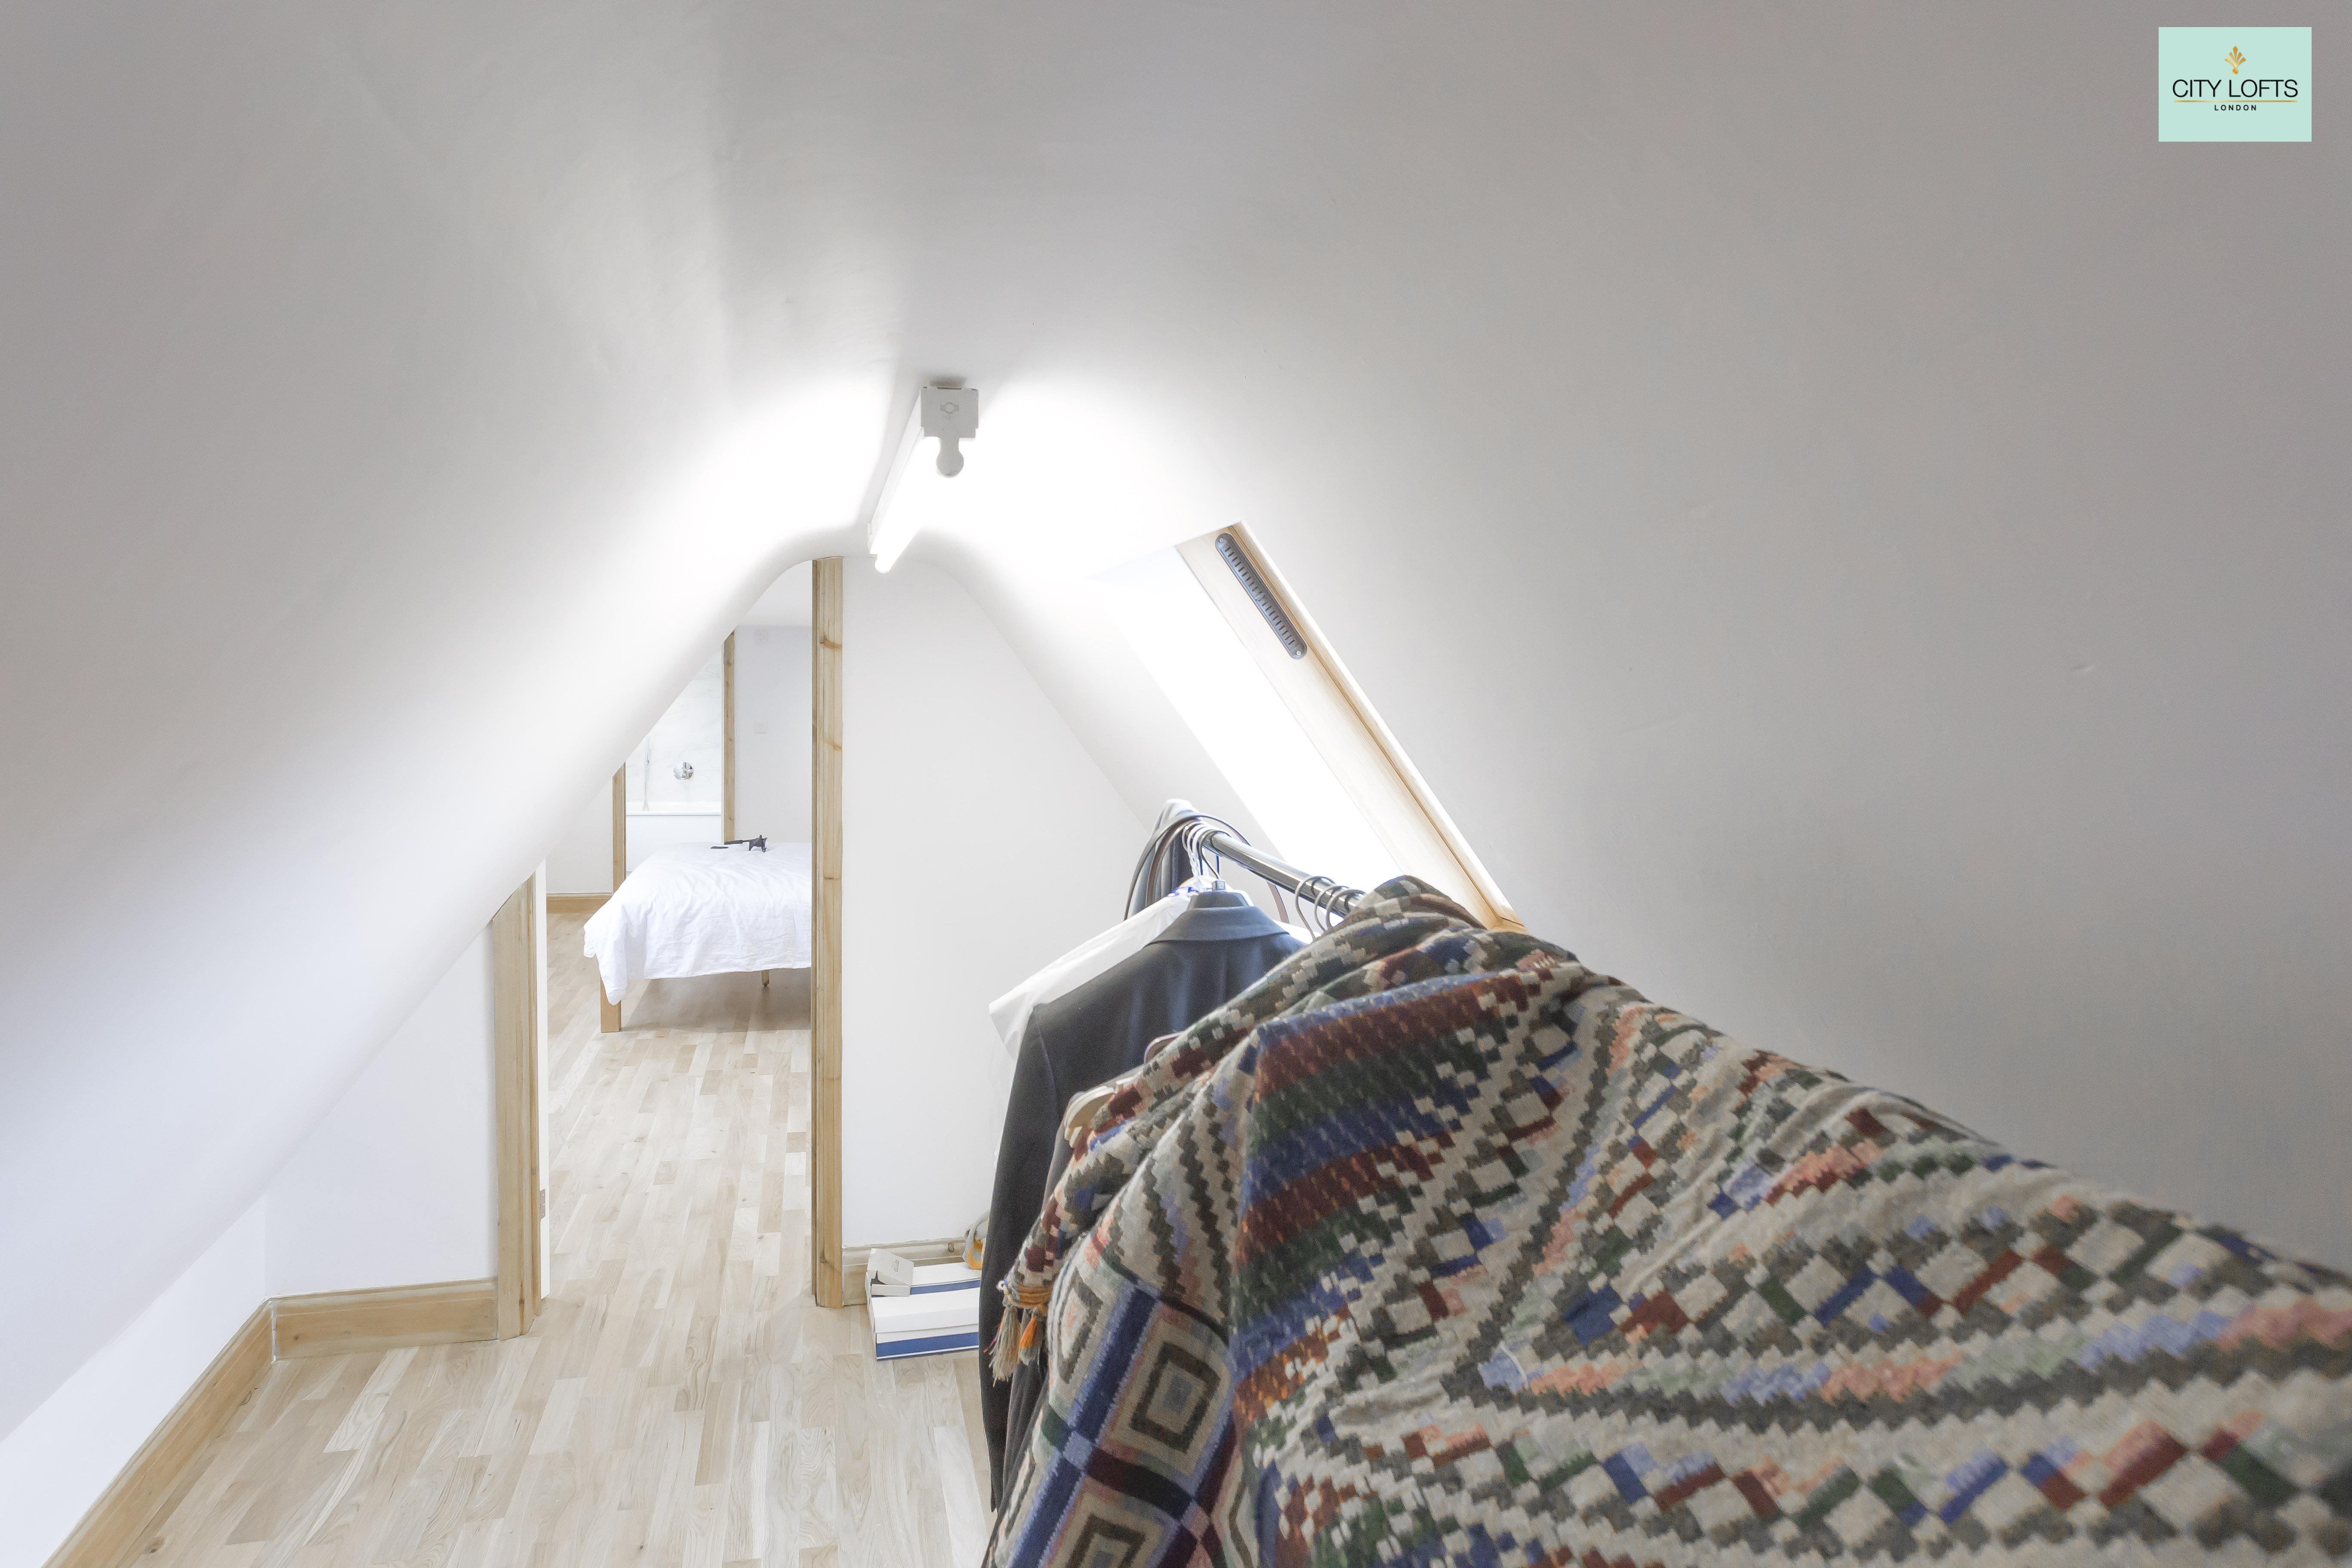 Totteridge loft conversion storage